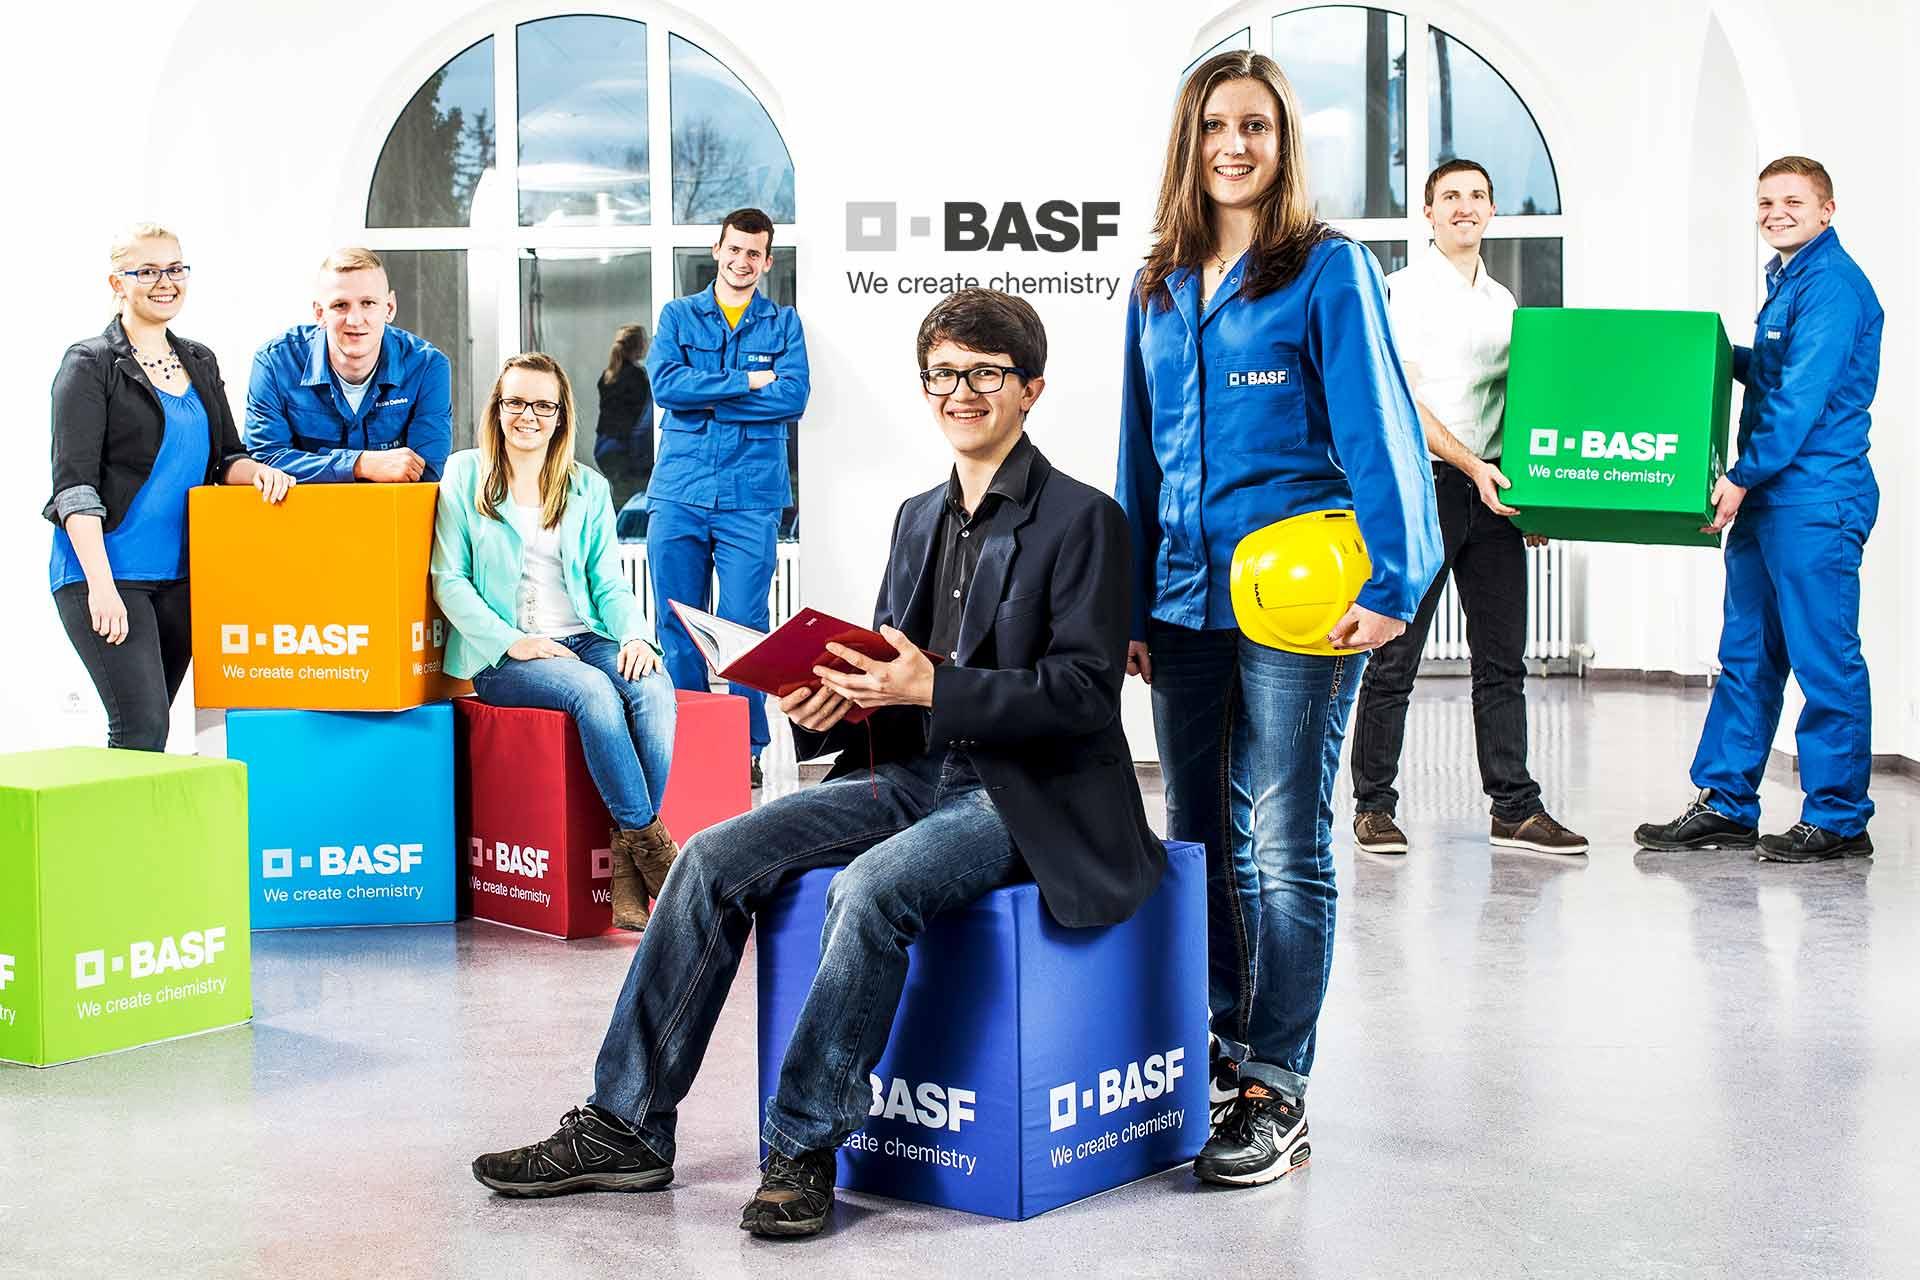 BASF Auszubildende Fotoshooting